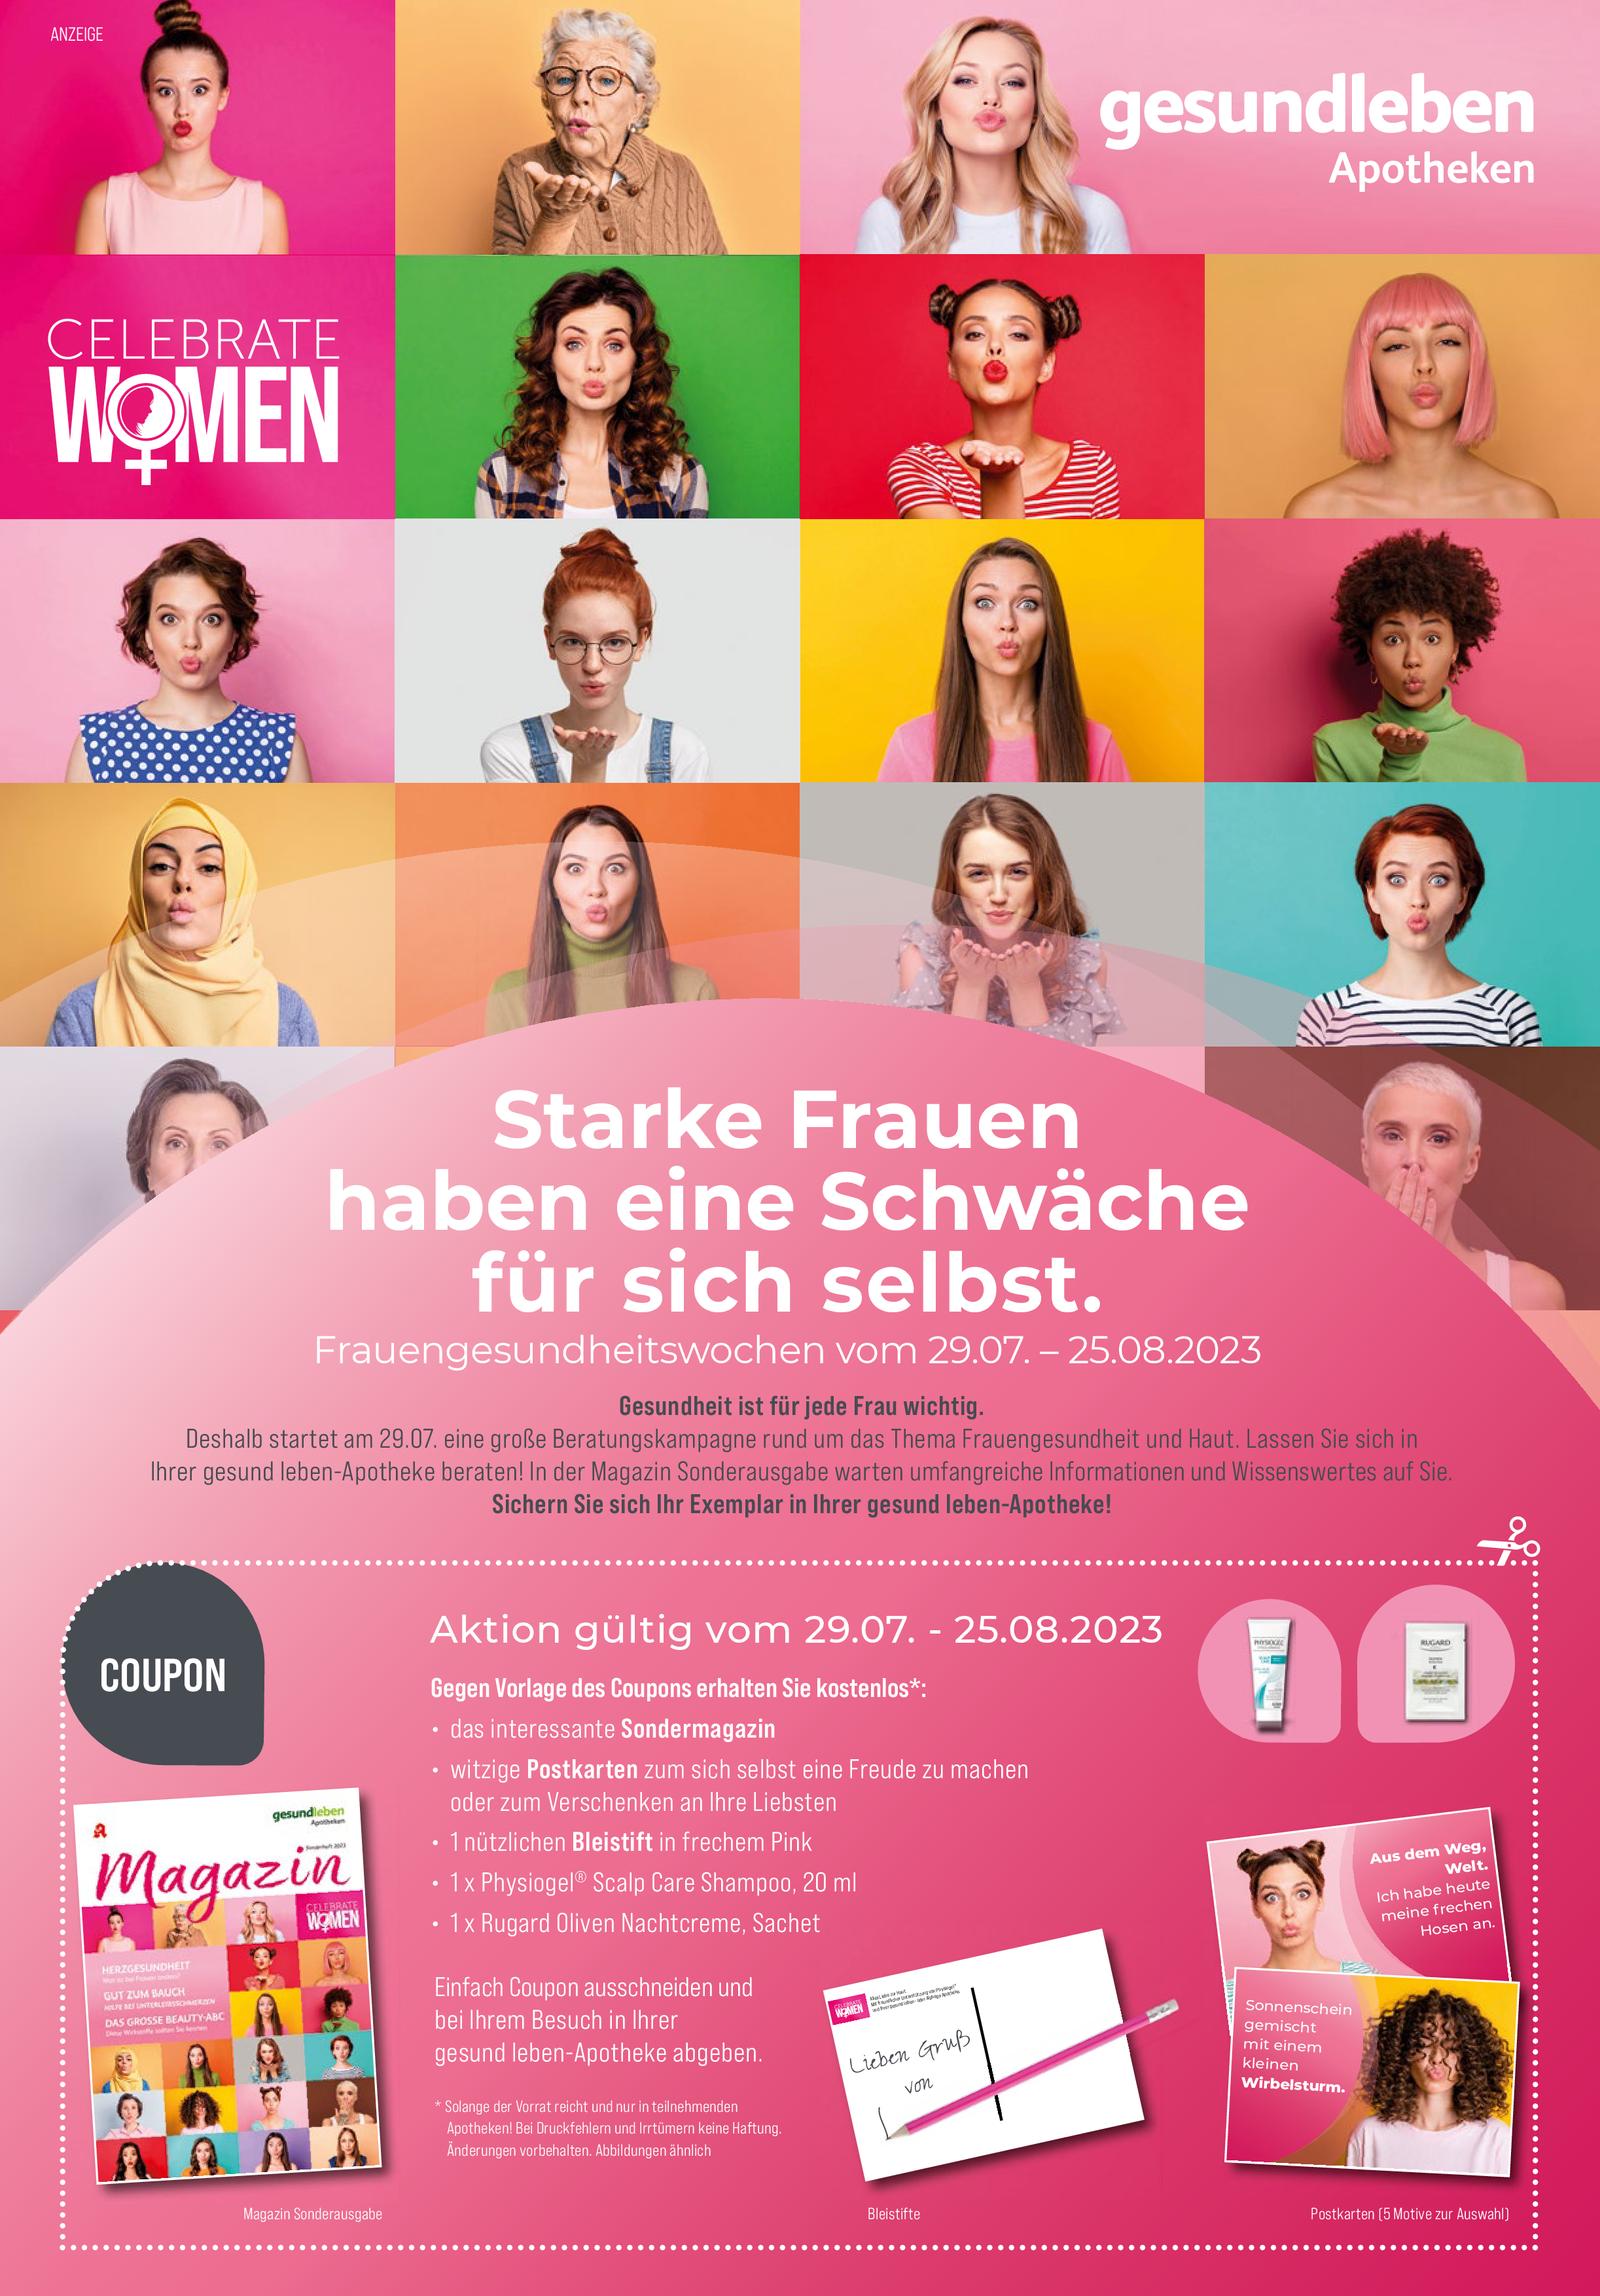 https://mein-uploads.apocdn.net/14723/leaflets/gesundleben_niedrig-Seite5.png